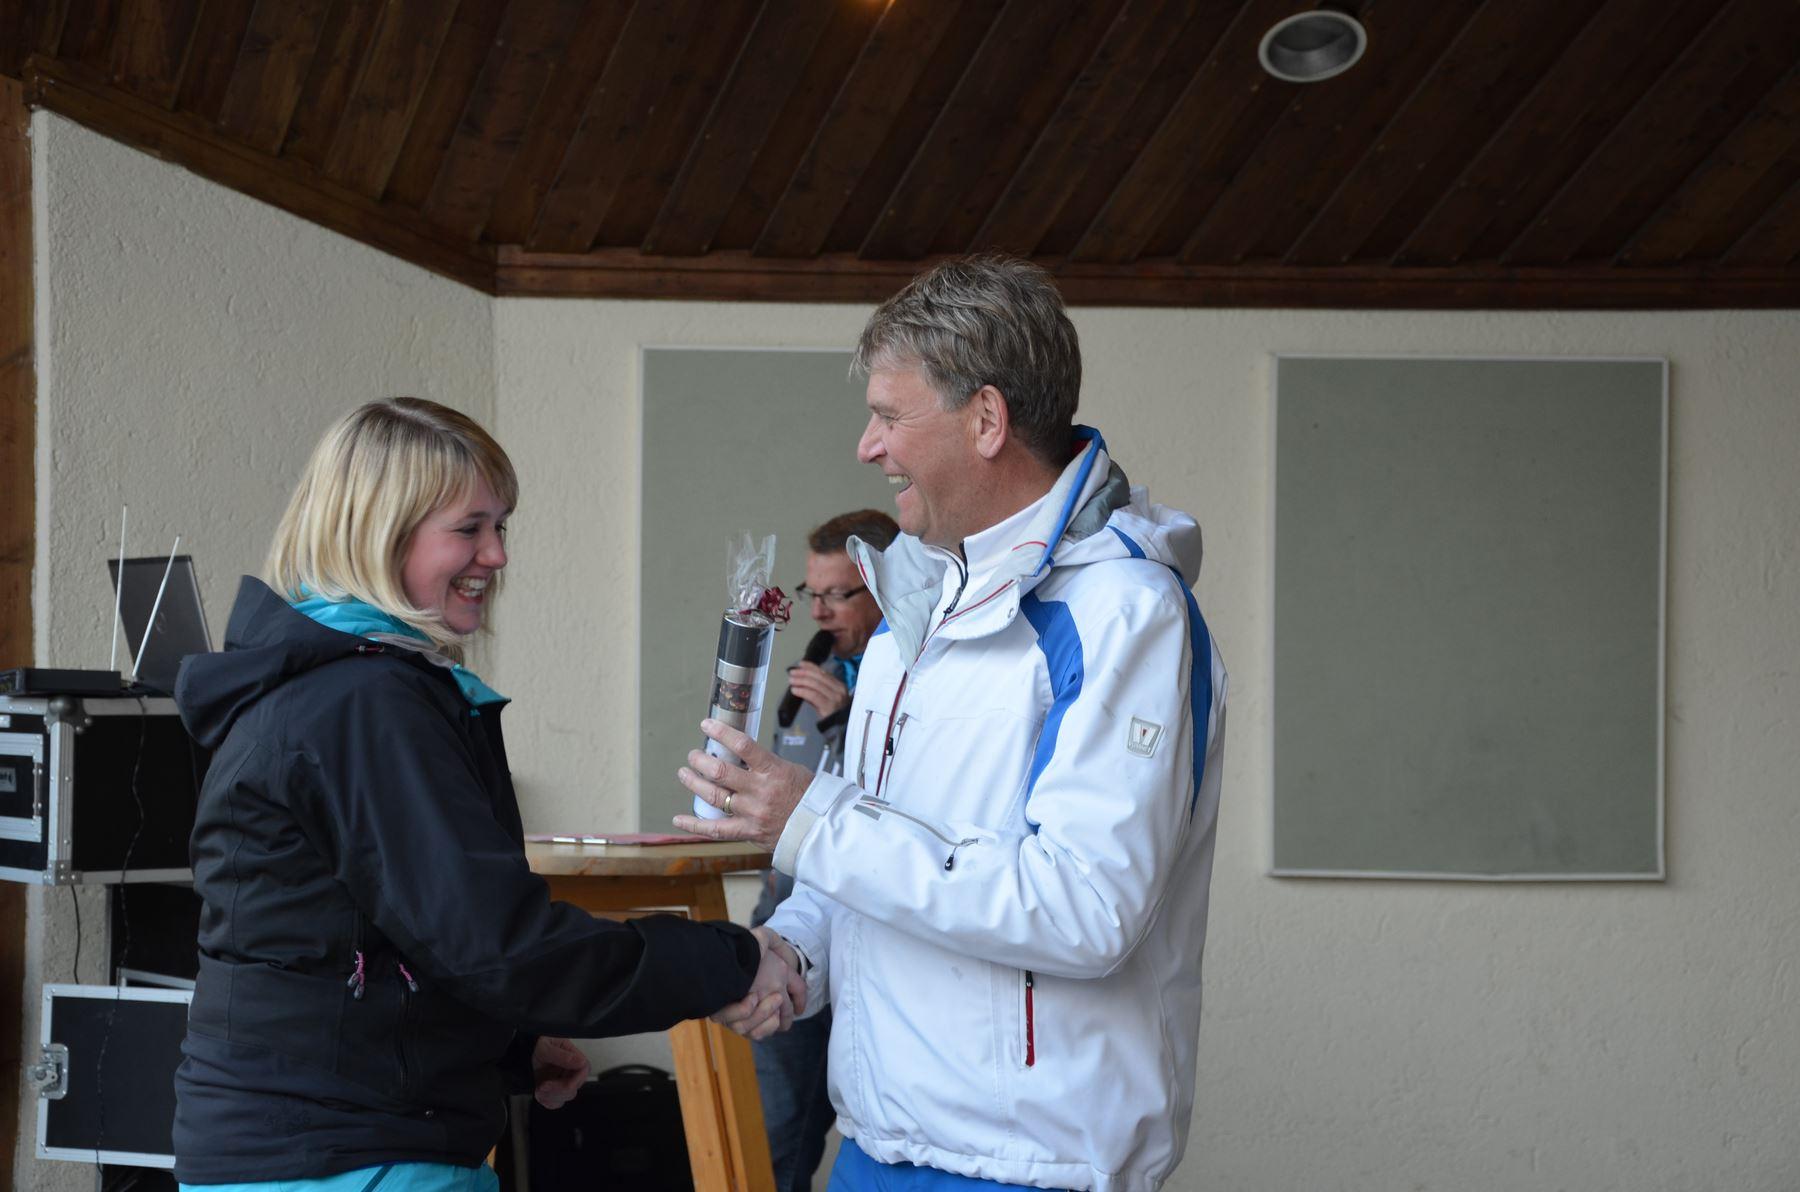 2015-03-22 BV Zillertal Skirennen 478.JPG